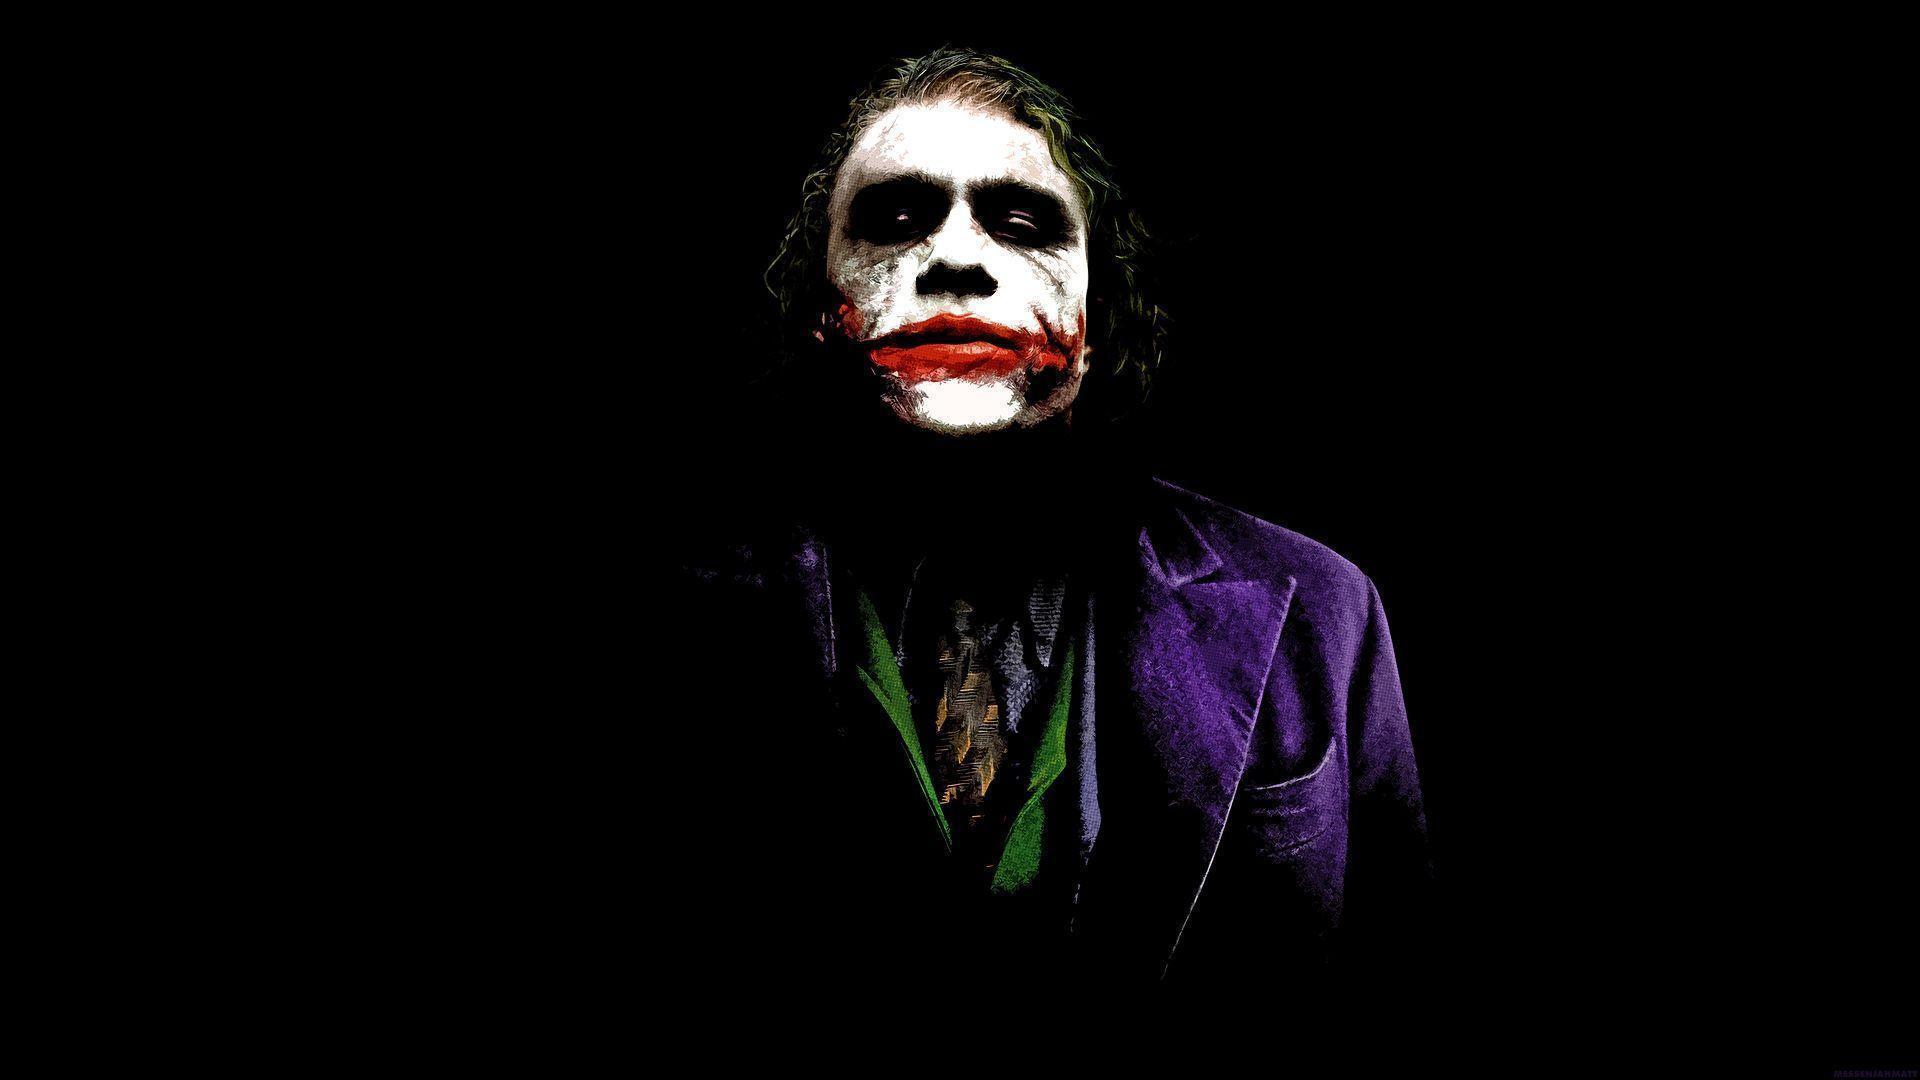 The Joker Wallpapers - Wallpaper Cave